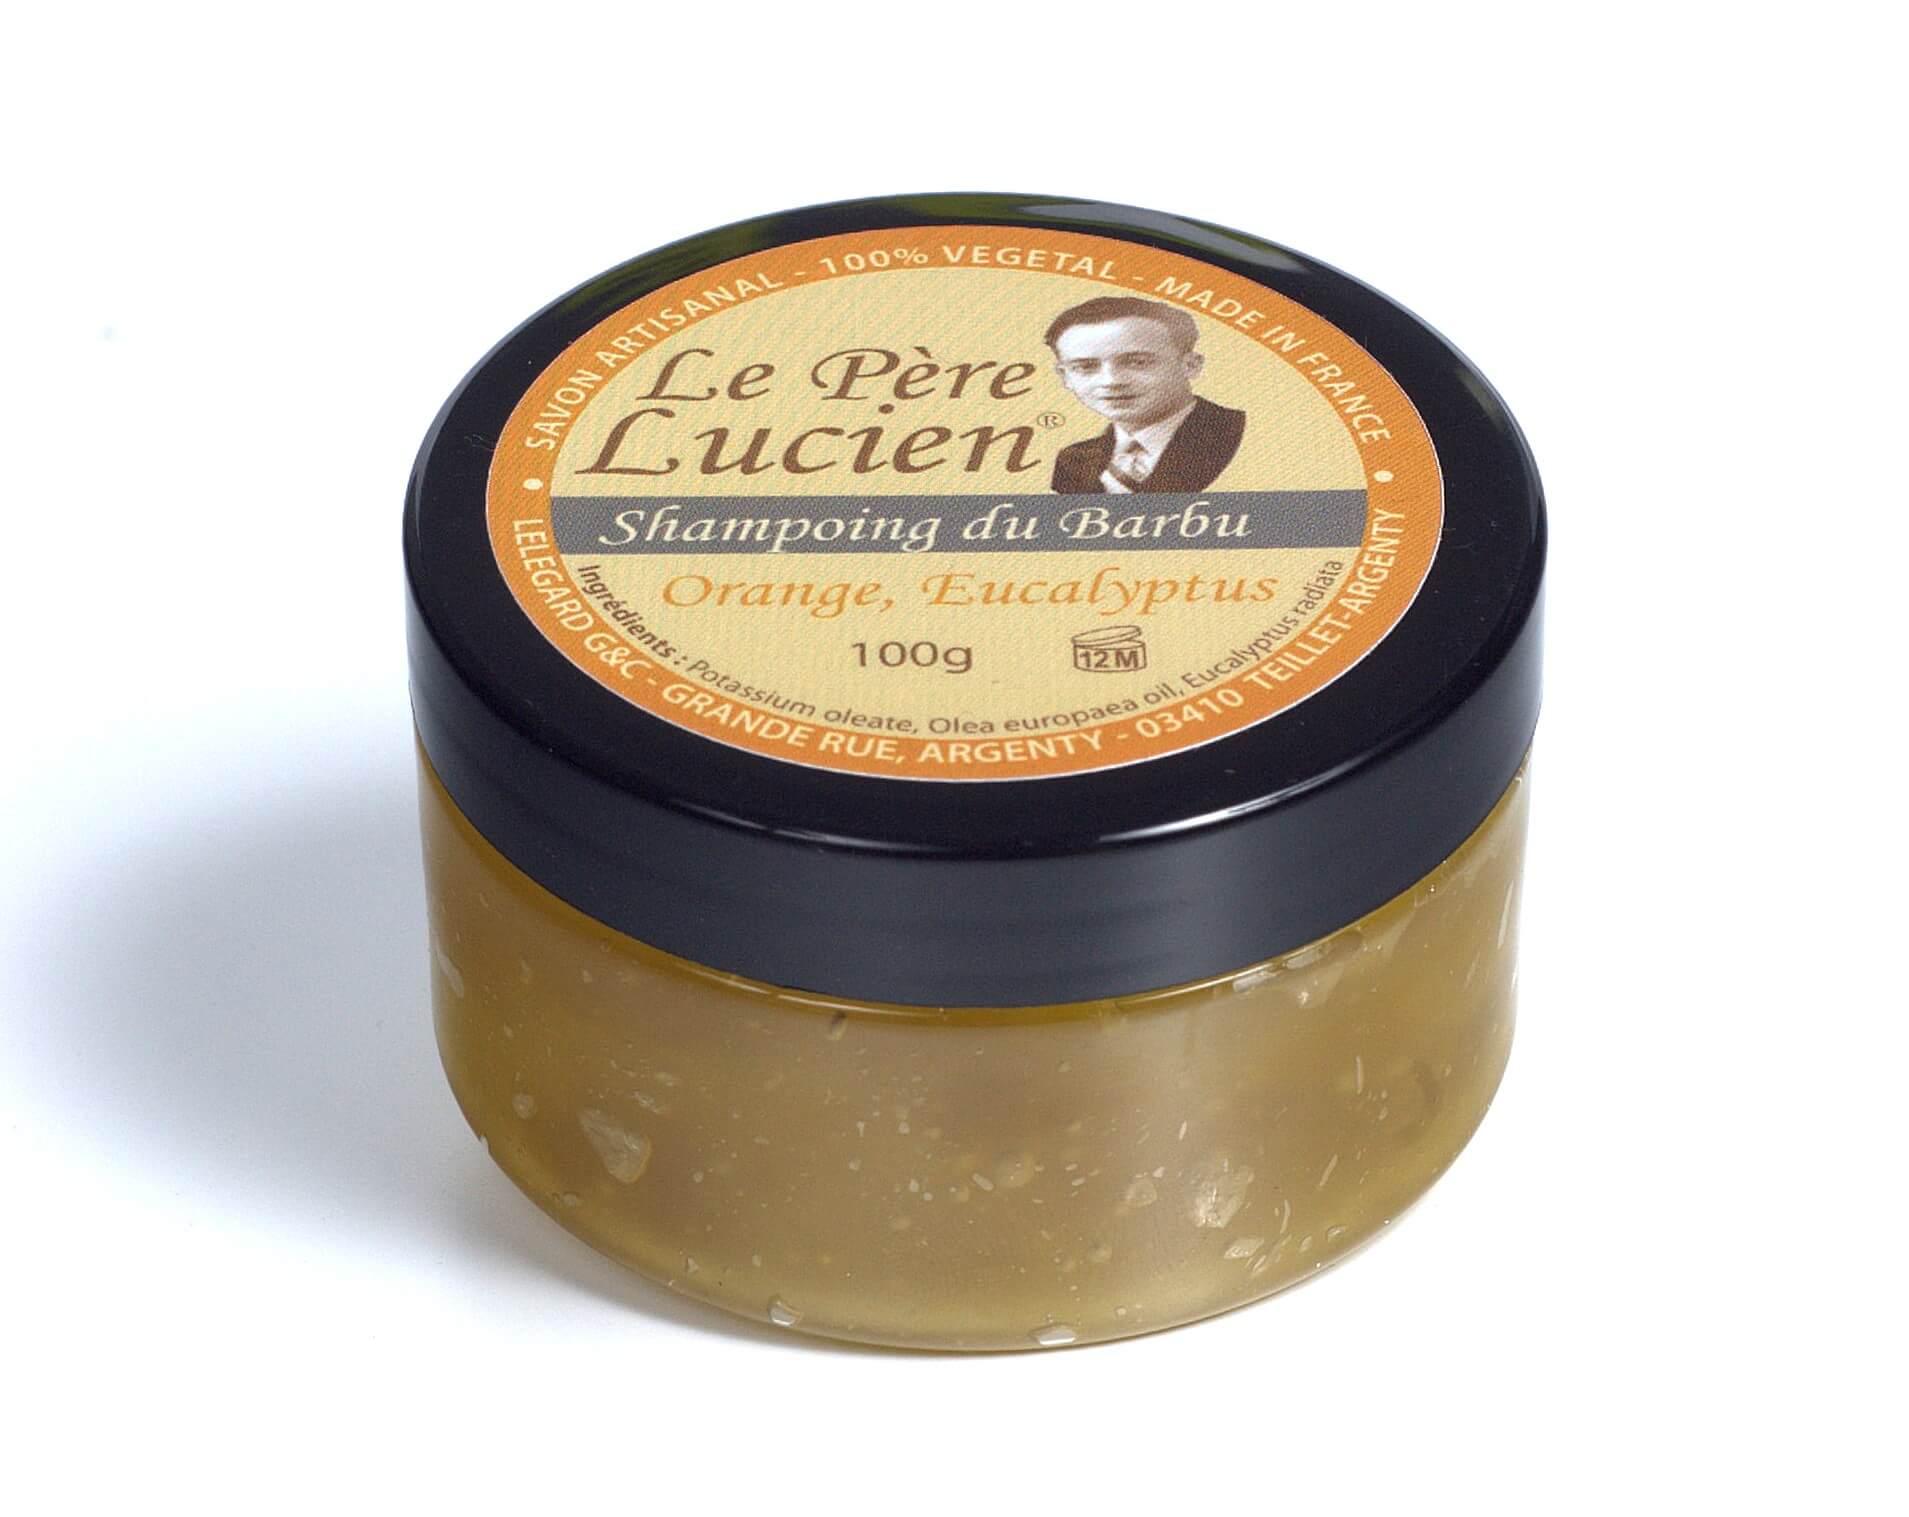 SAC Avril 2016 - Page 6 1-le-pere-lucien-savon-a-raser-shaving-soap-lpl-